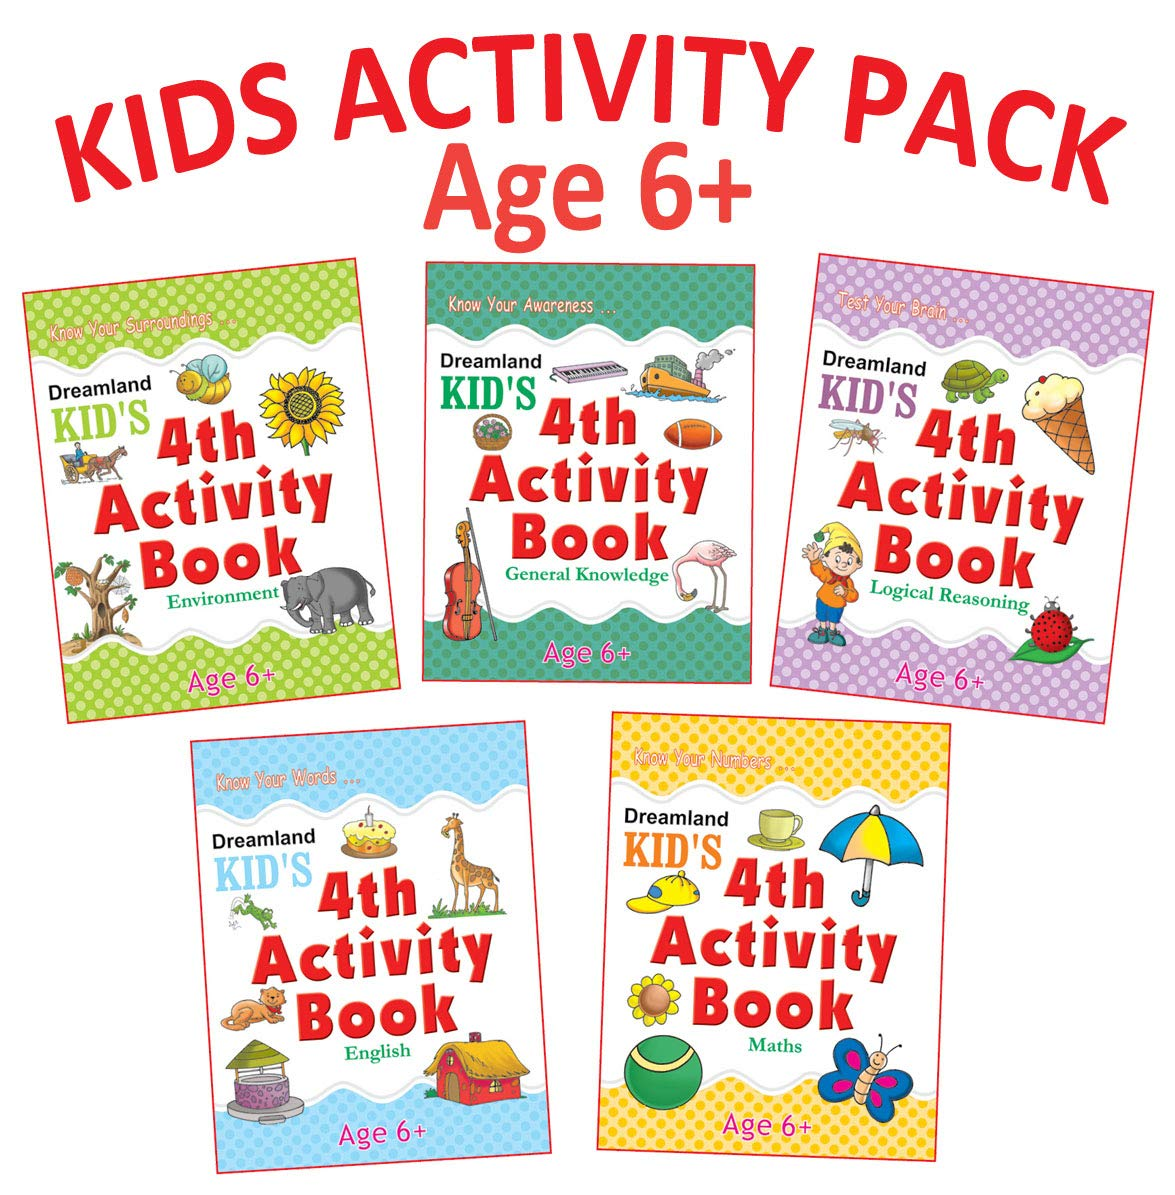 Kid's 4th Activity - Pack (5 Titles- English, Maths, Environment, General Awareness, Logic Reasoning)